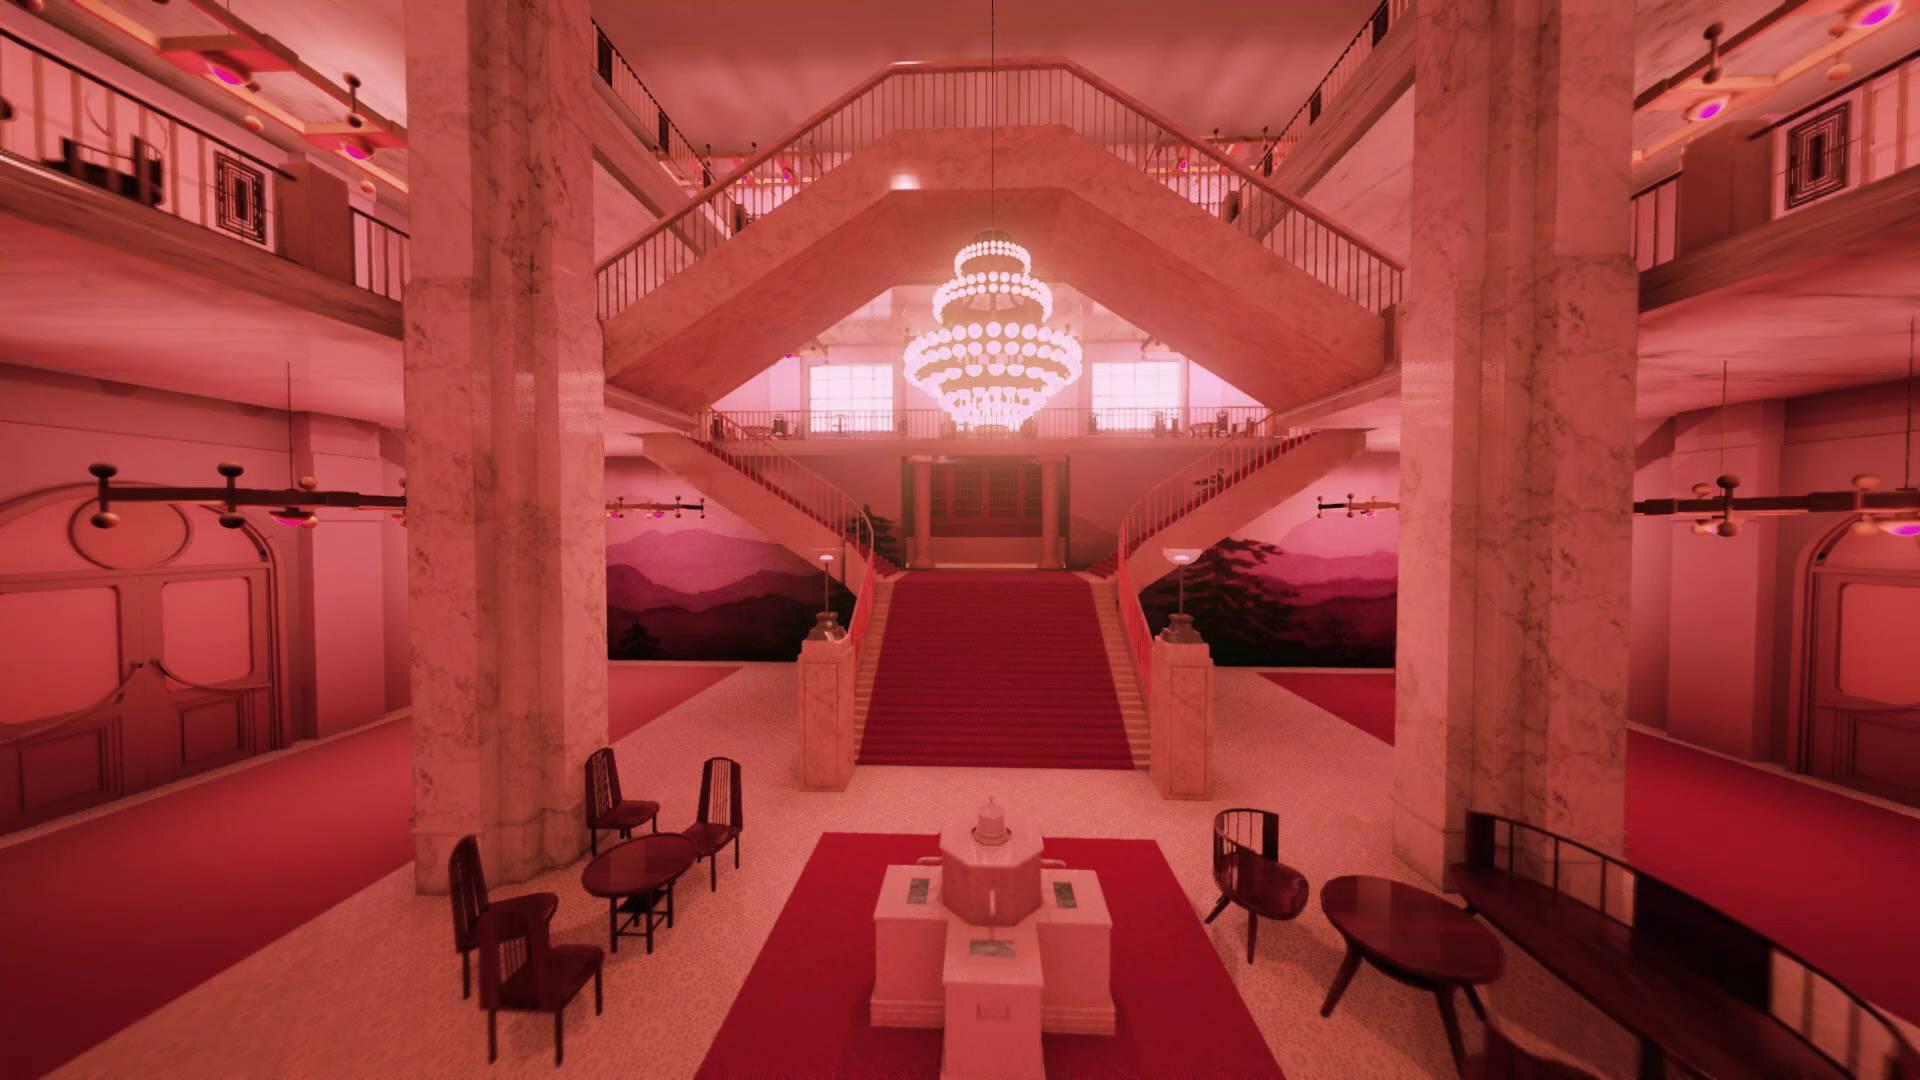 Grand Budapest Hotel   Grand Budapest Hotel Room 1350620   HD 1920x1080